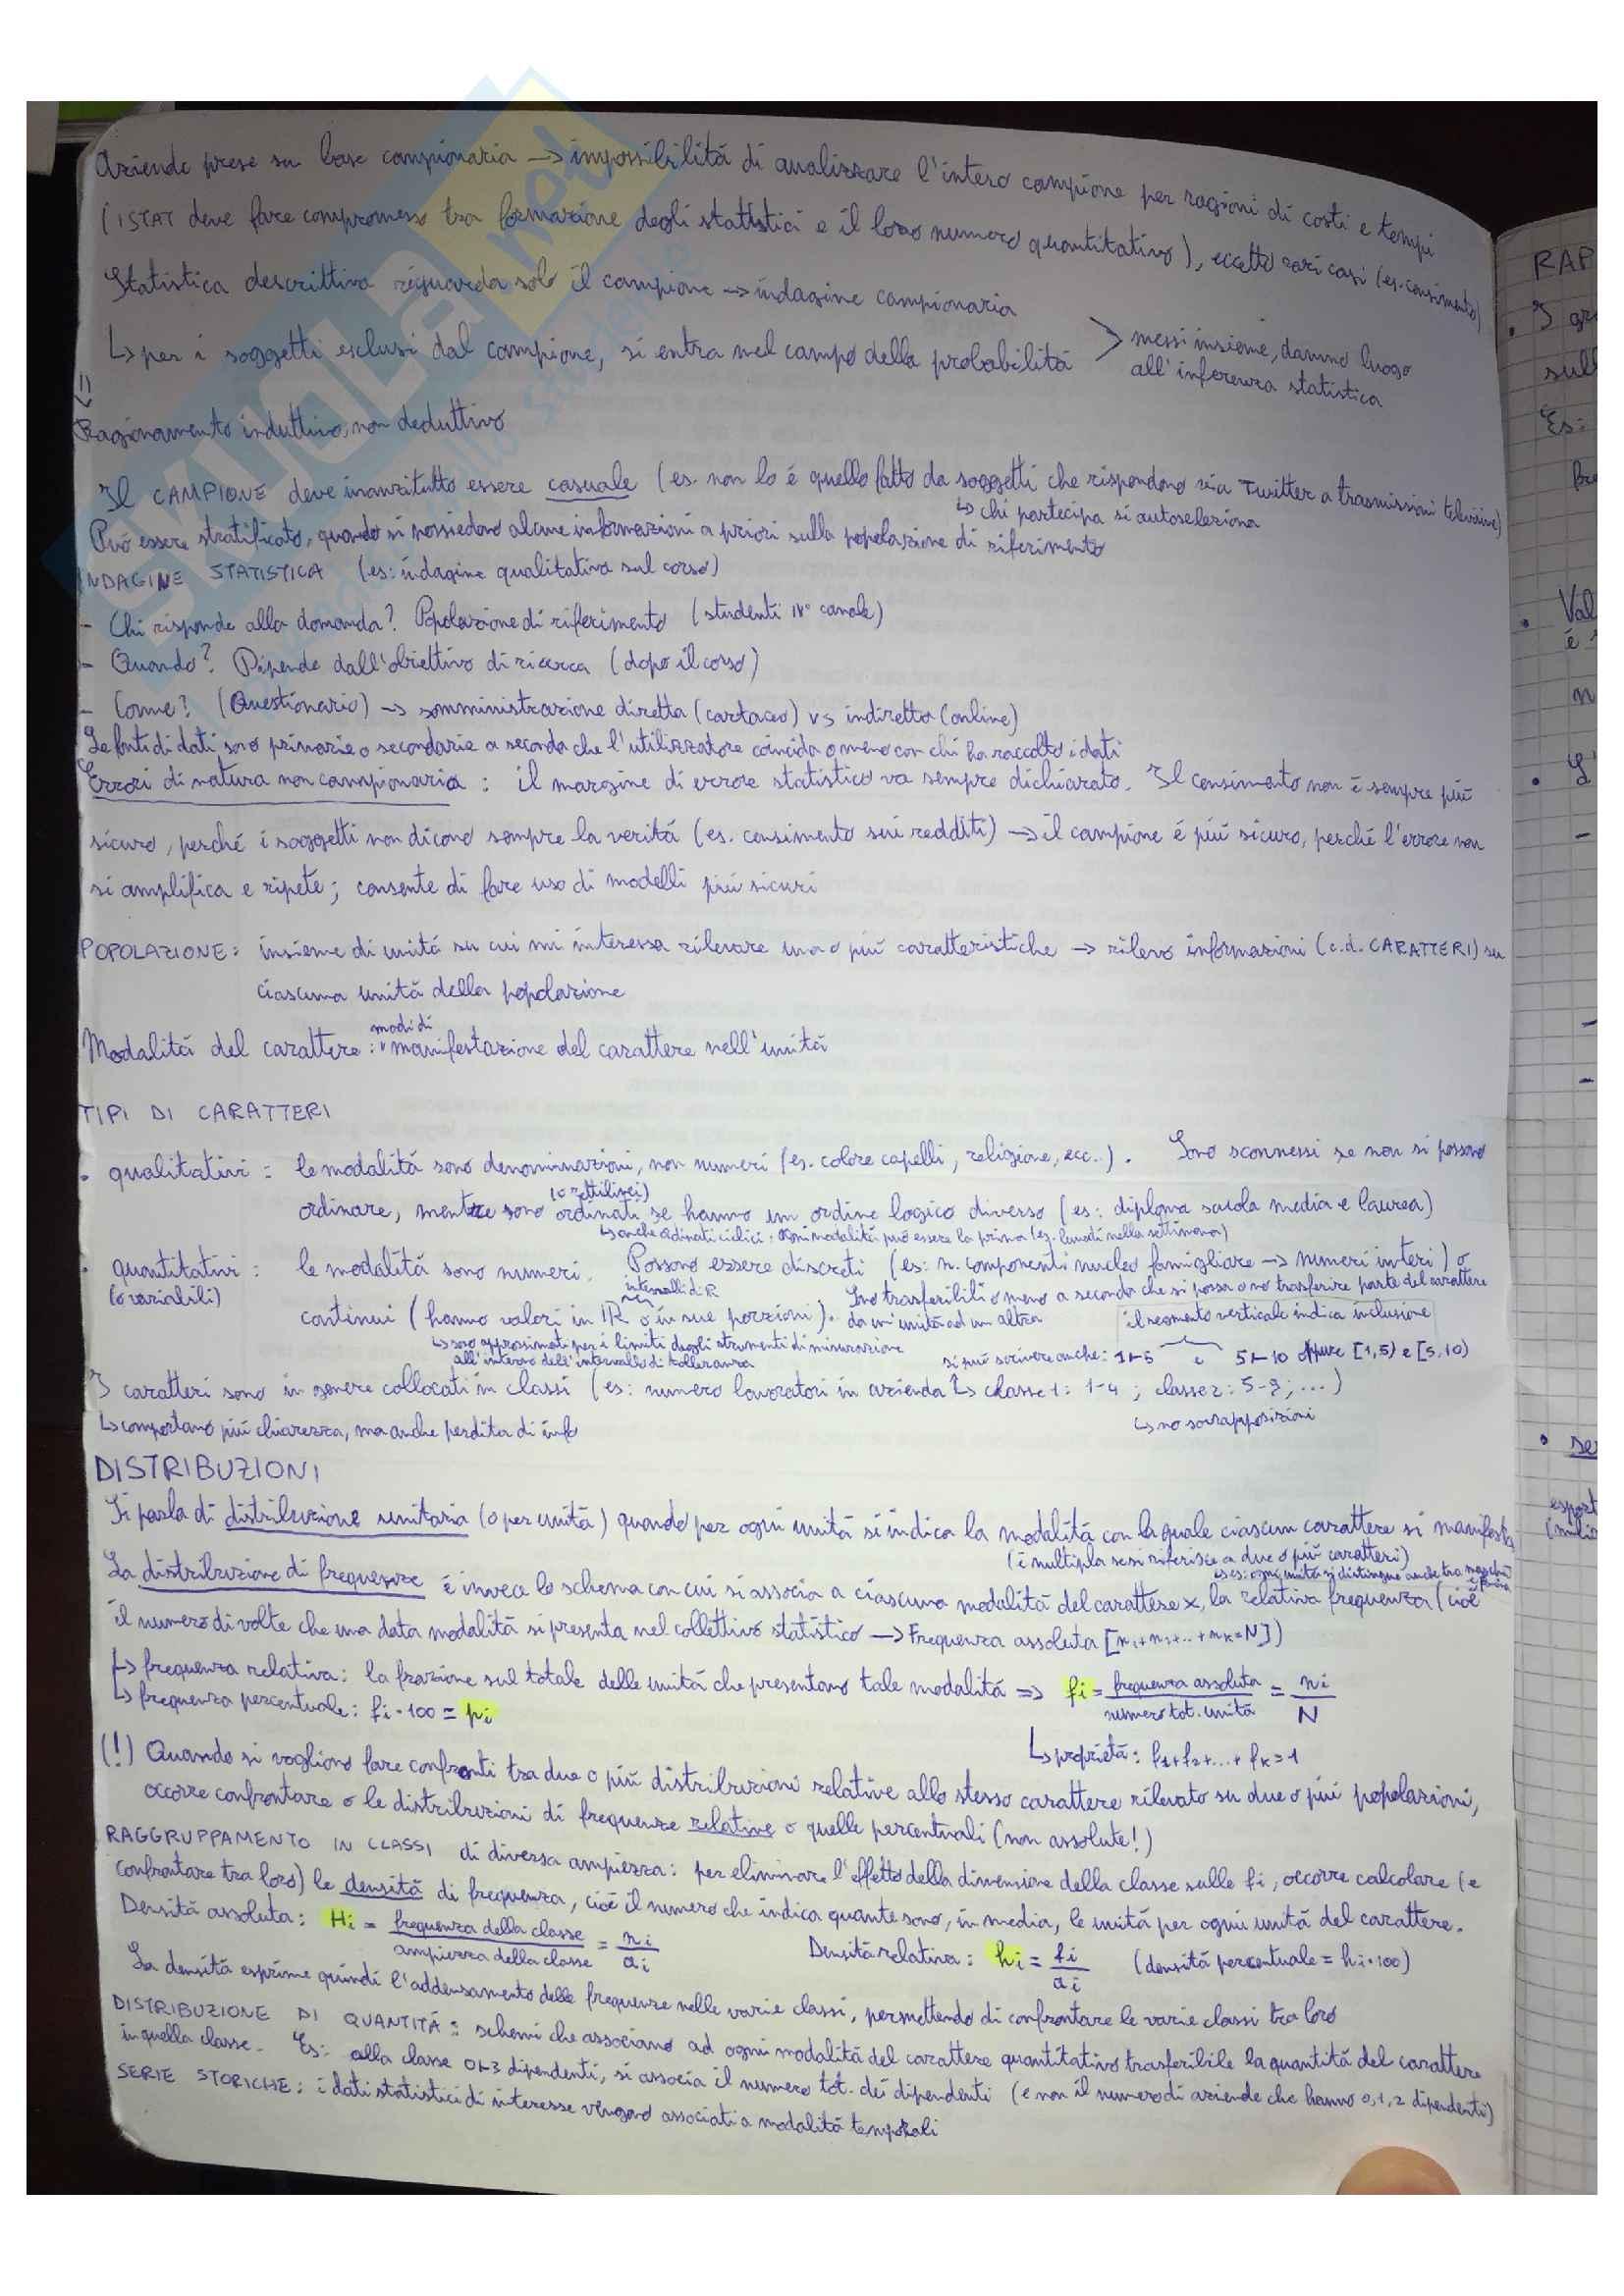 Appunti di Statistica, docente Paola Vicard